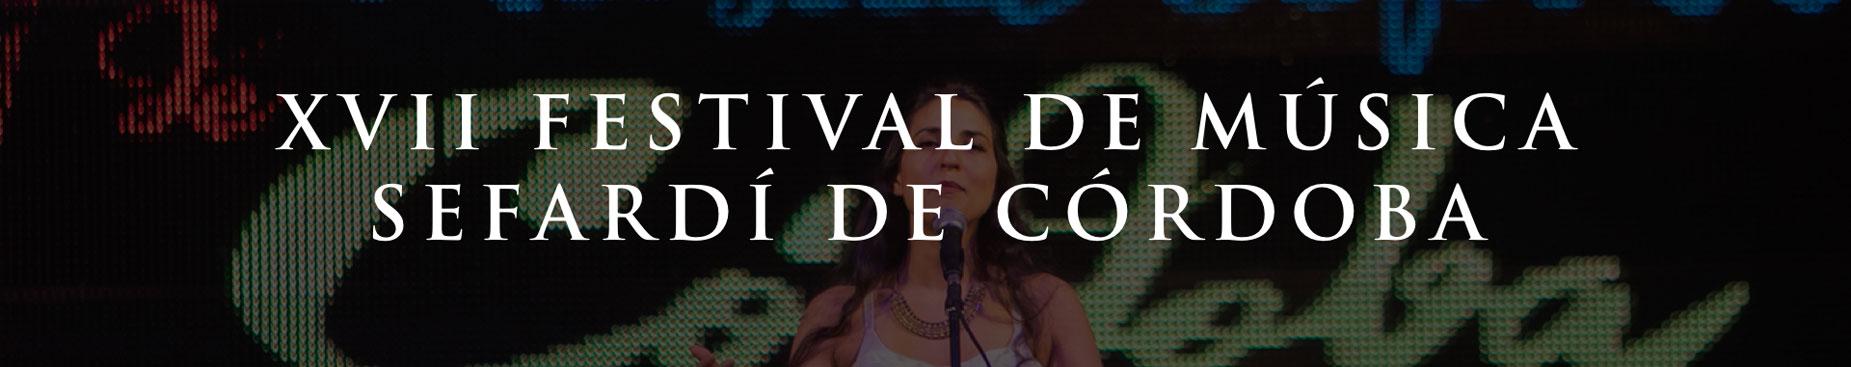 RDJ-HEADER-WEB-festival-musica-sefardi.001